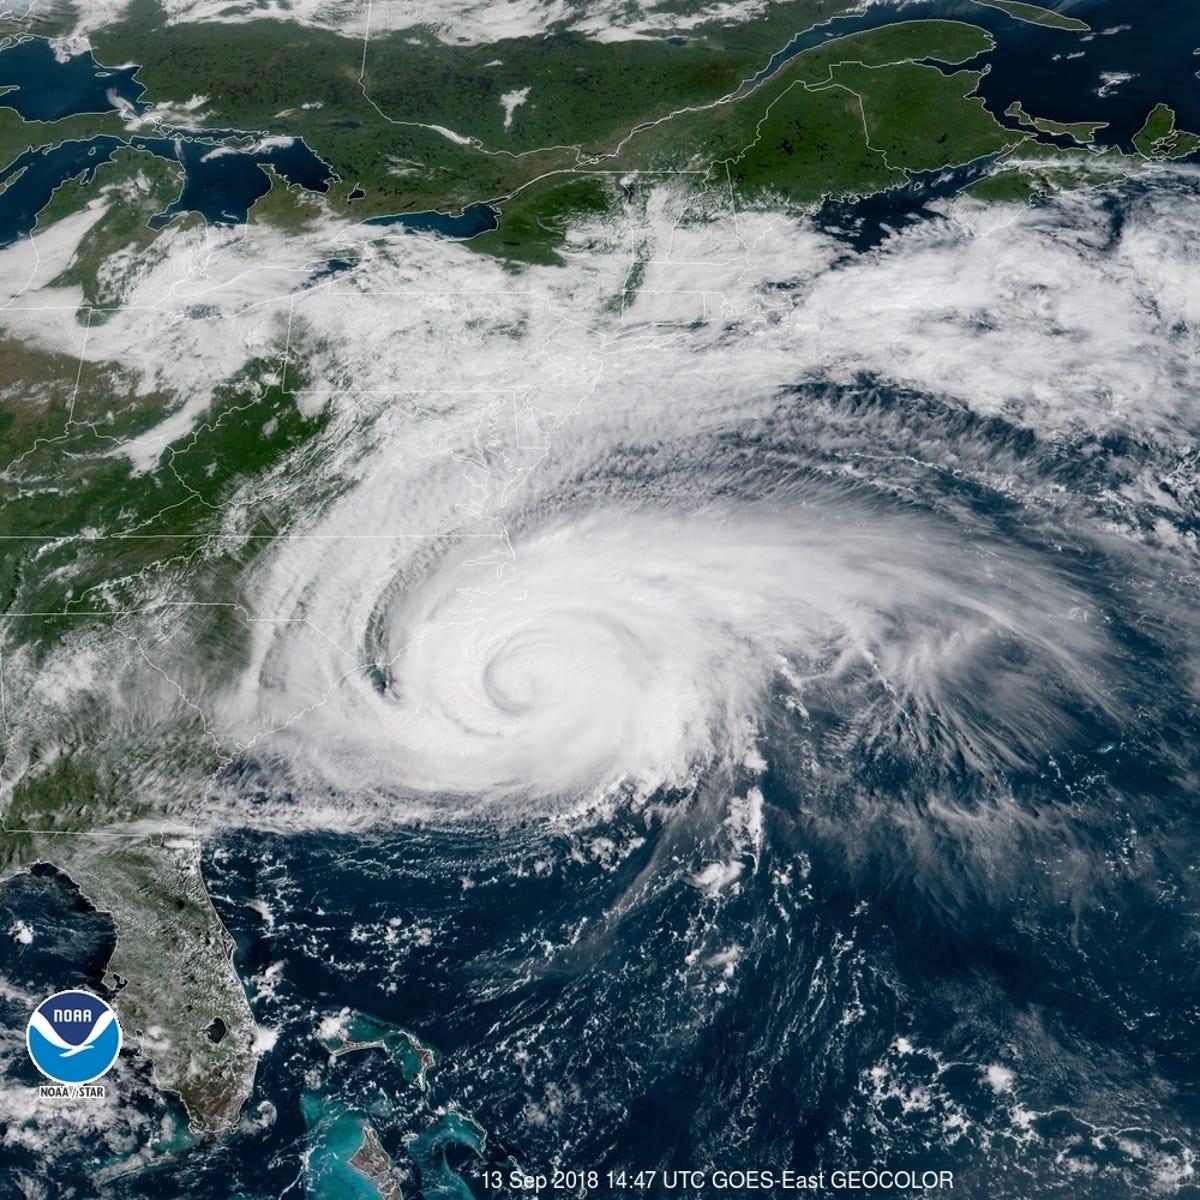 Hurricane Florence becoming a real-life Sharknado? Viral